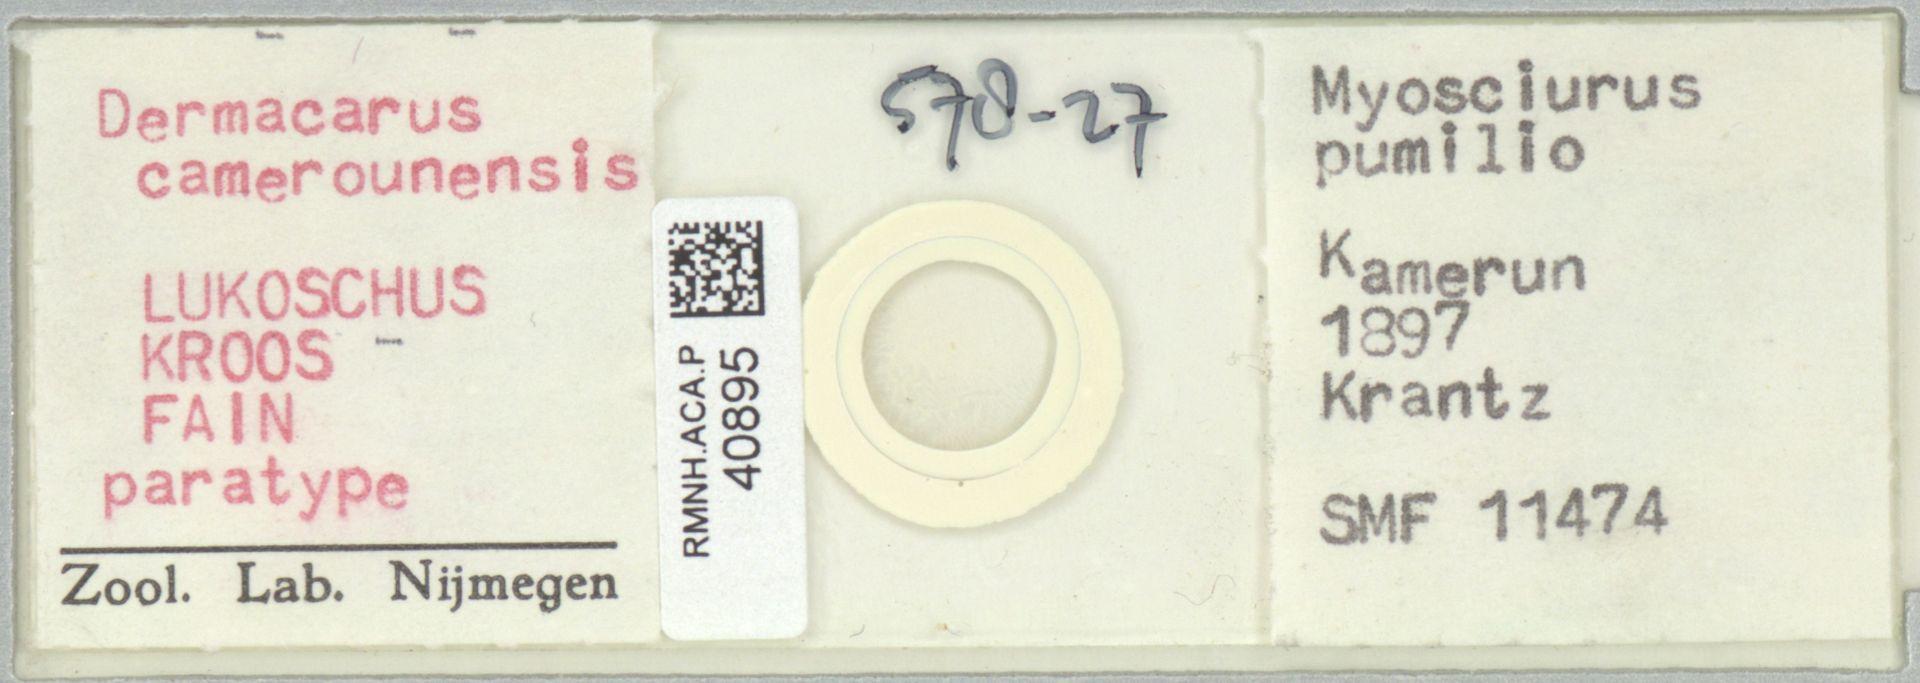 RMNH.ACA.P.40895 | Dermacarus camerounensis Lukoschus Kroos Fain